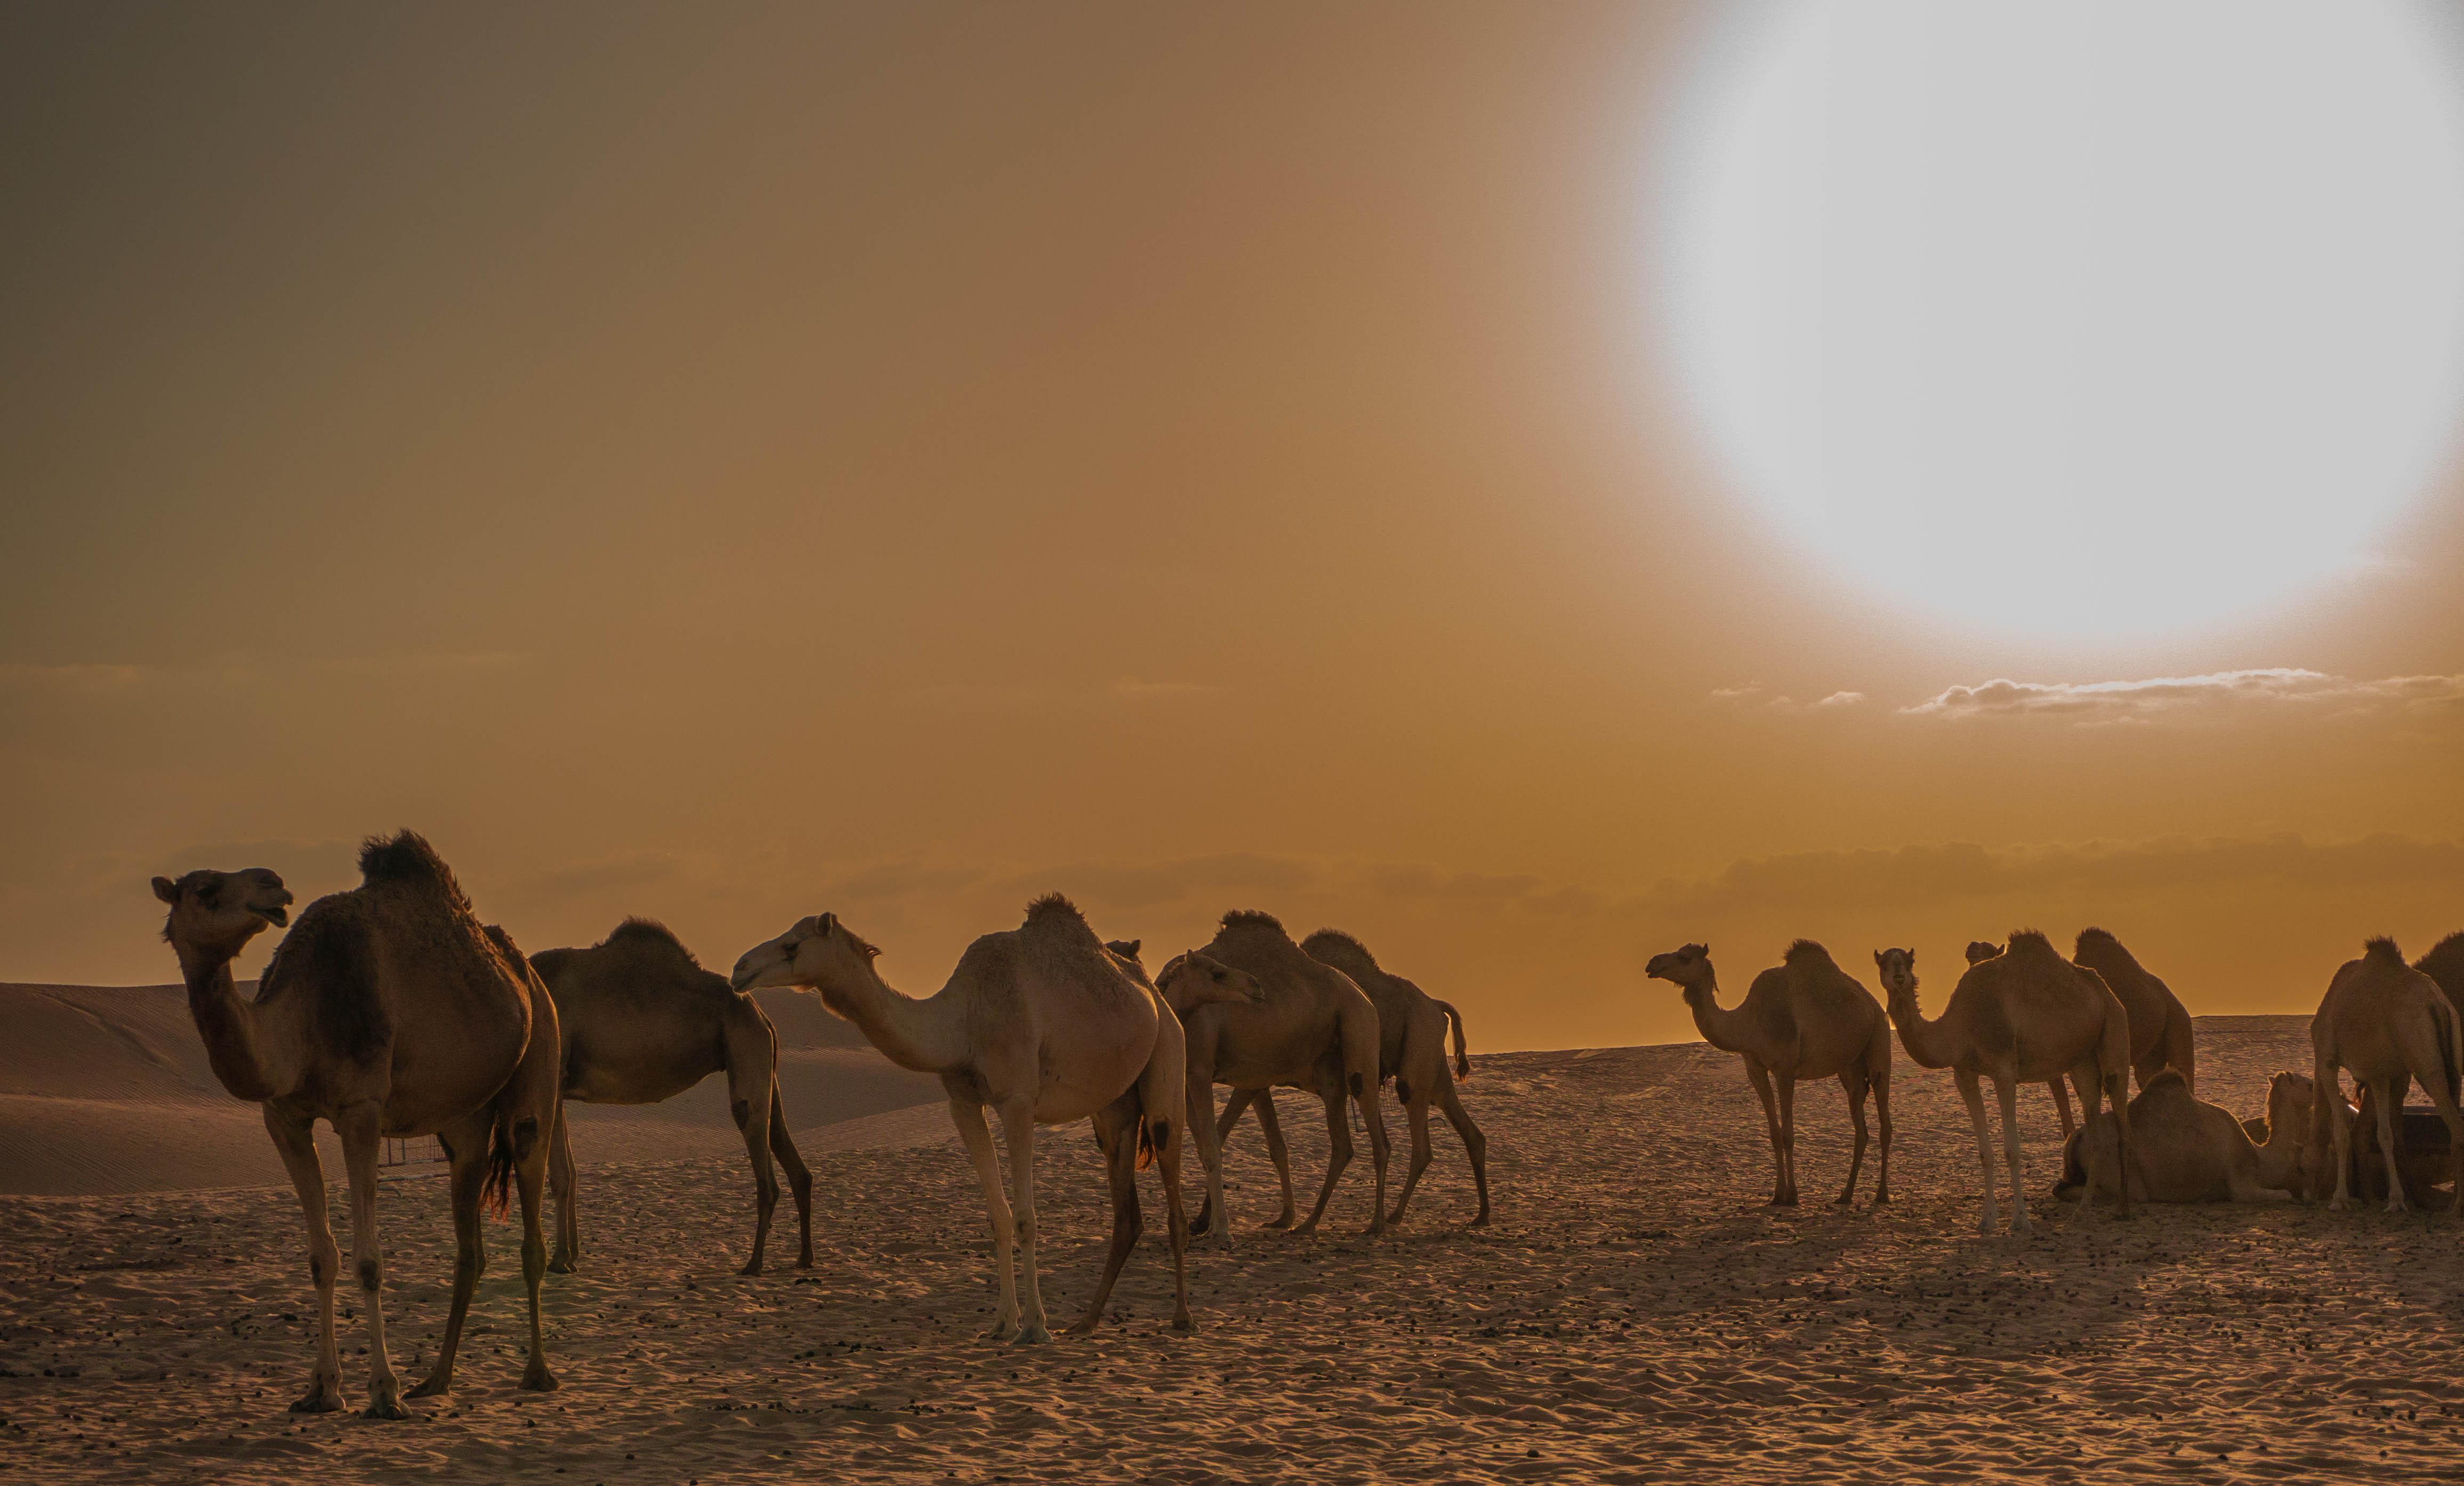 Wallpaper landscape sand sky morning wildlife desert dubai landscape sand sky morning wildlife desert dubai camels cameltoe sahara steppe camel herd uae ecosystem aeolian thecheapjerseys Choice Image